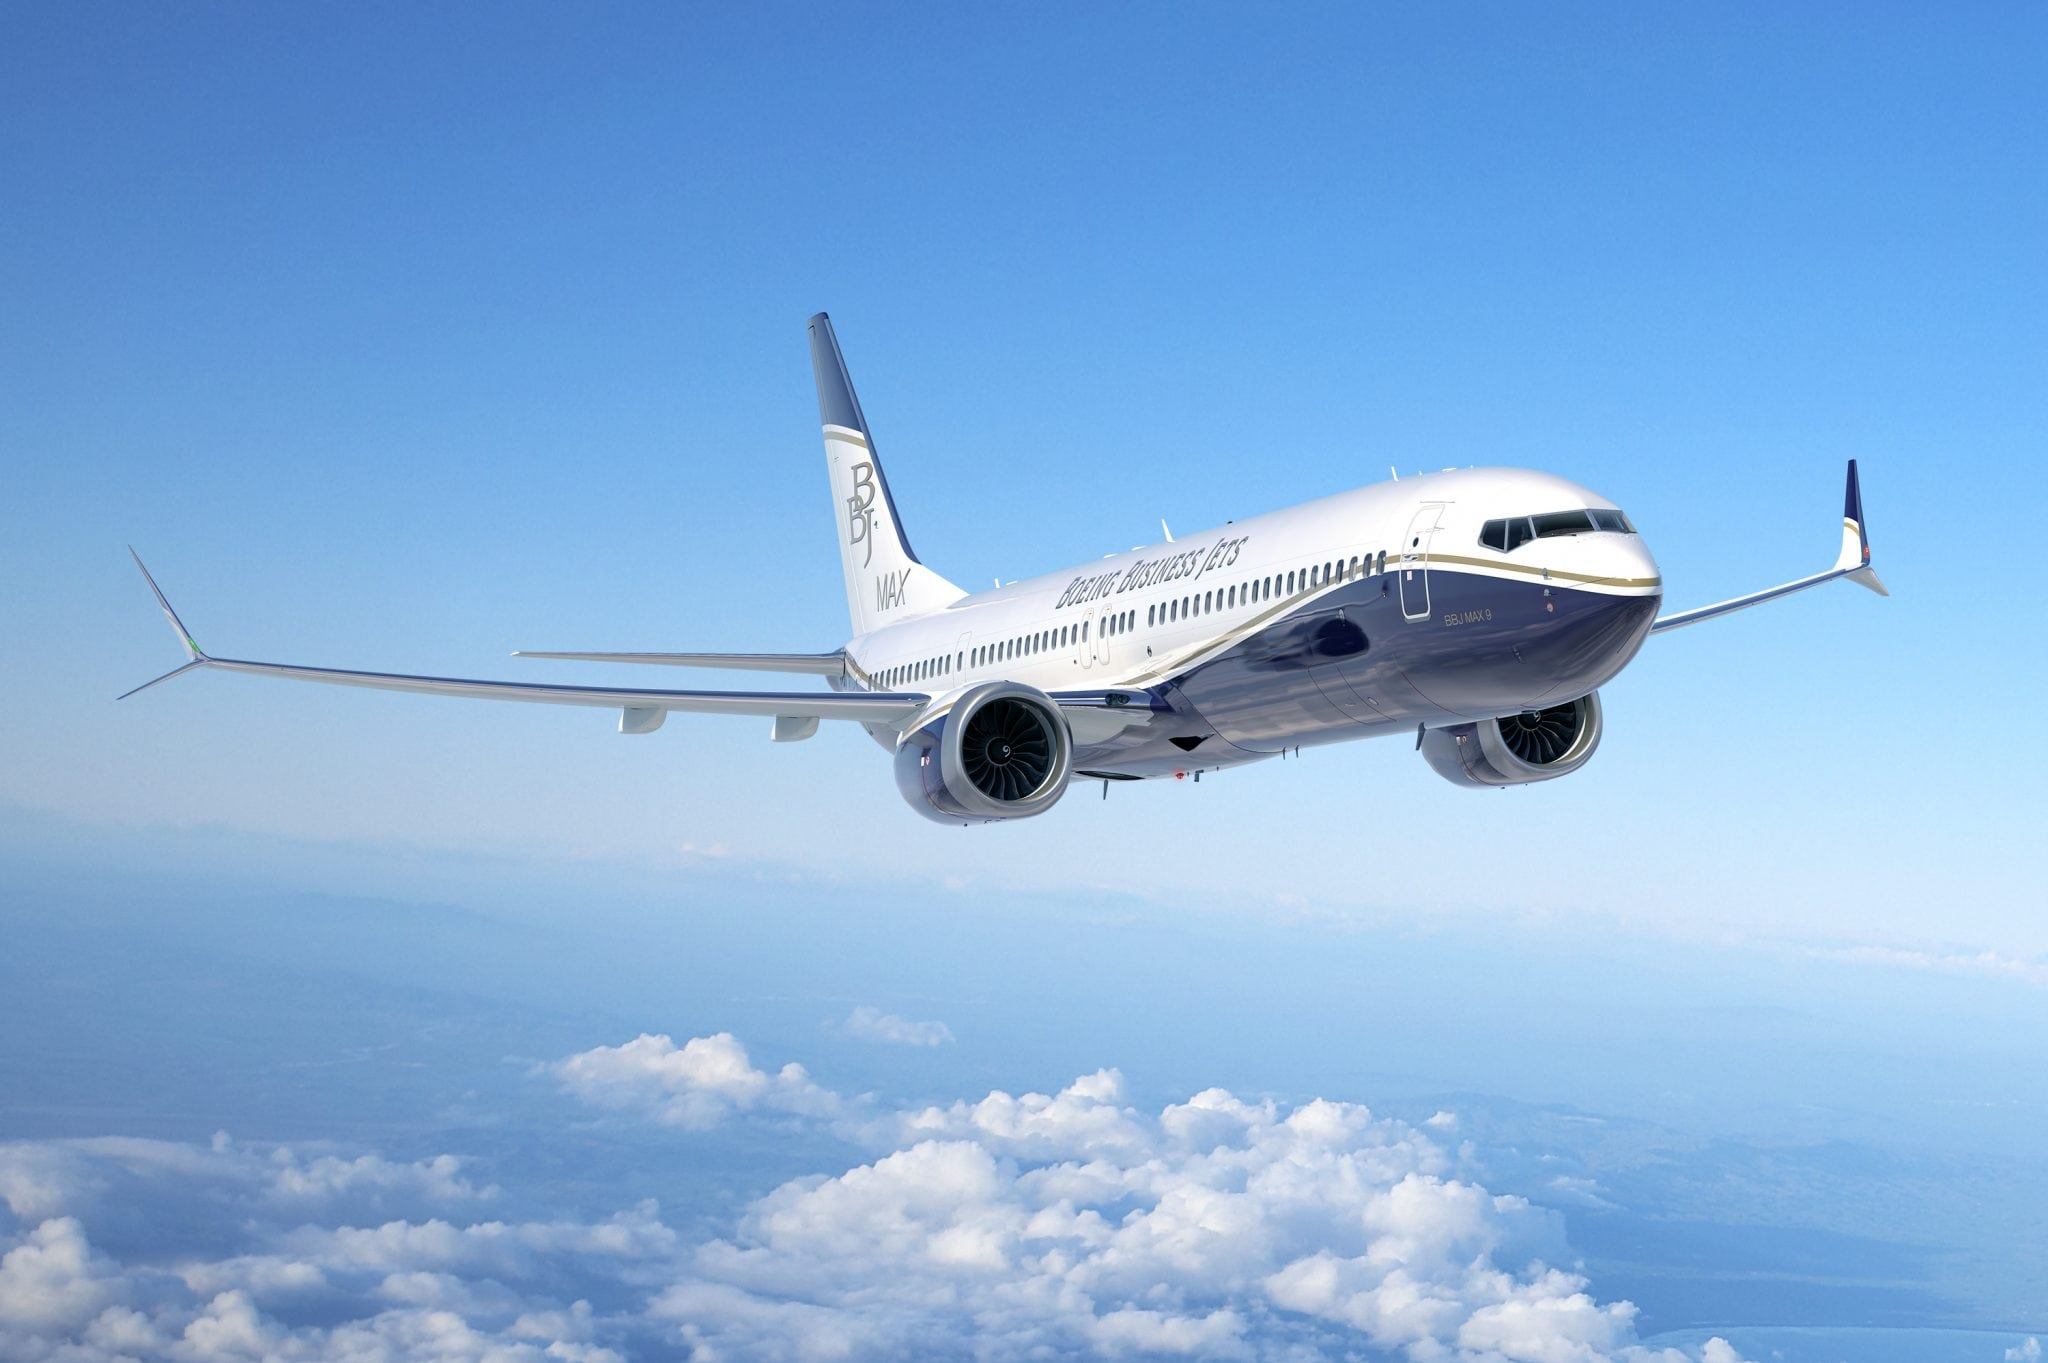 Boeing Business Jet Max 9 in flight